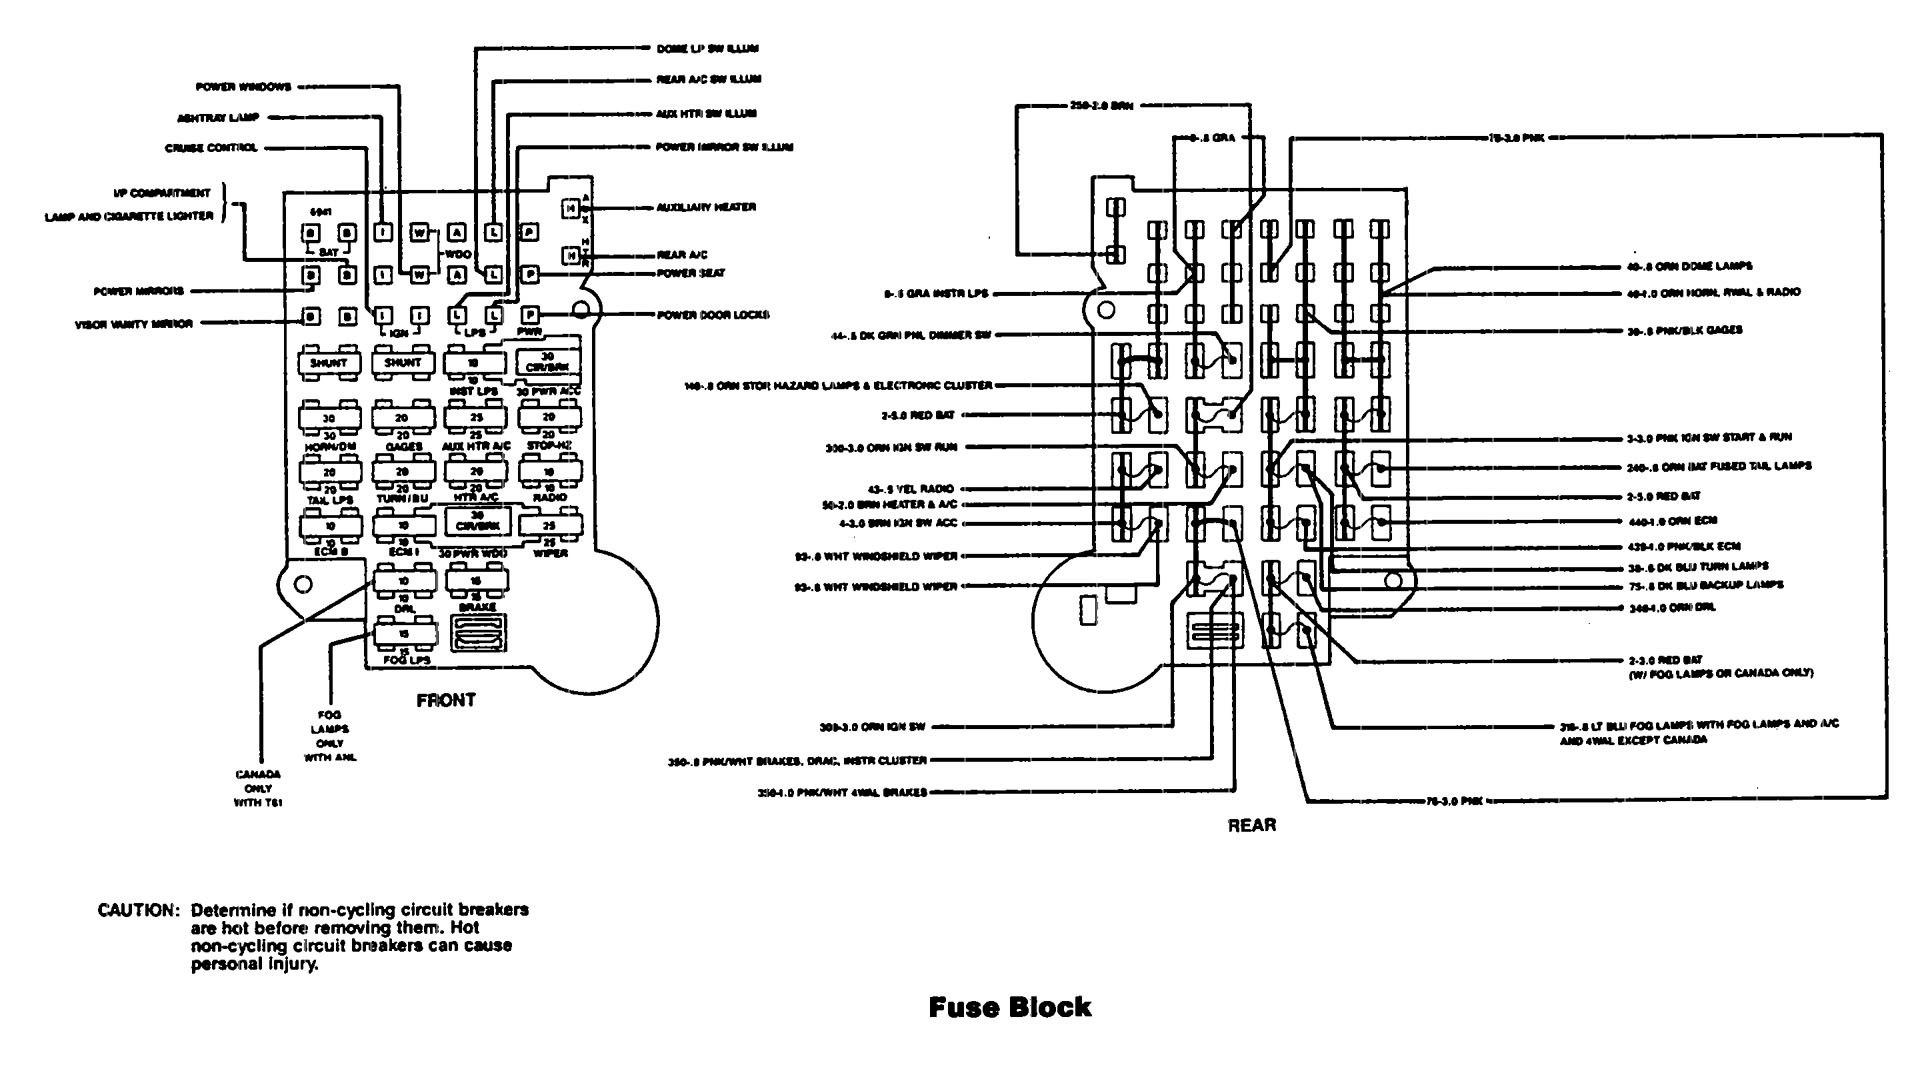 Diagram Sheet Wiring Data L016303 Libraries Valves Gas Ef33cw233 1995 Ranger B Boat Diagrams1995 Library 1987